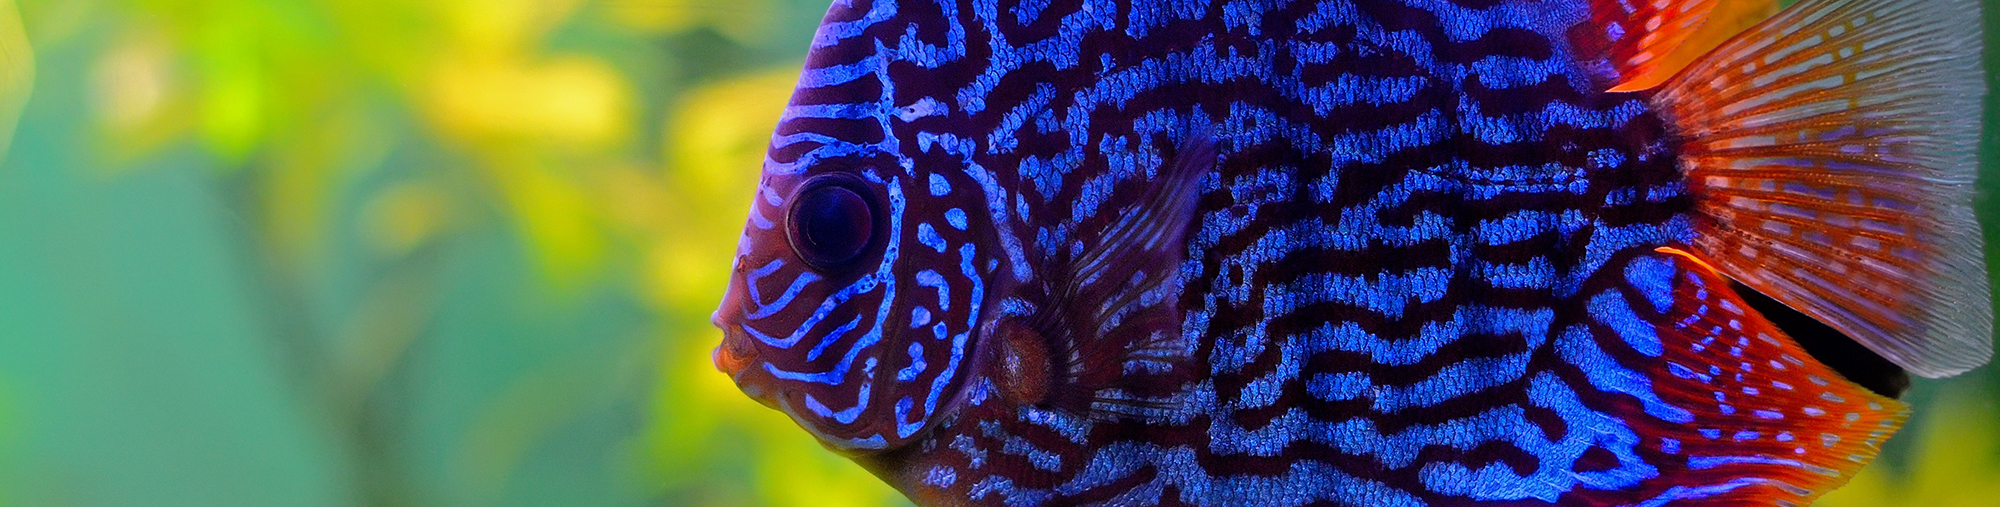 Fish color, מדפסות לייזר לקסמרק, מדפסות לייזר משולבות לקסמרק, מדפסות לייזר משולבות lexmark, מכונות צילום משולבות konica minolta, מדפ